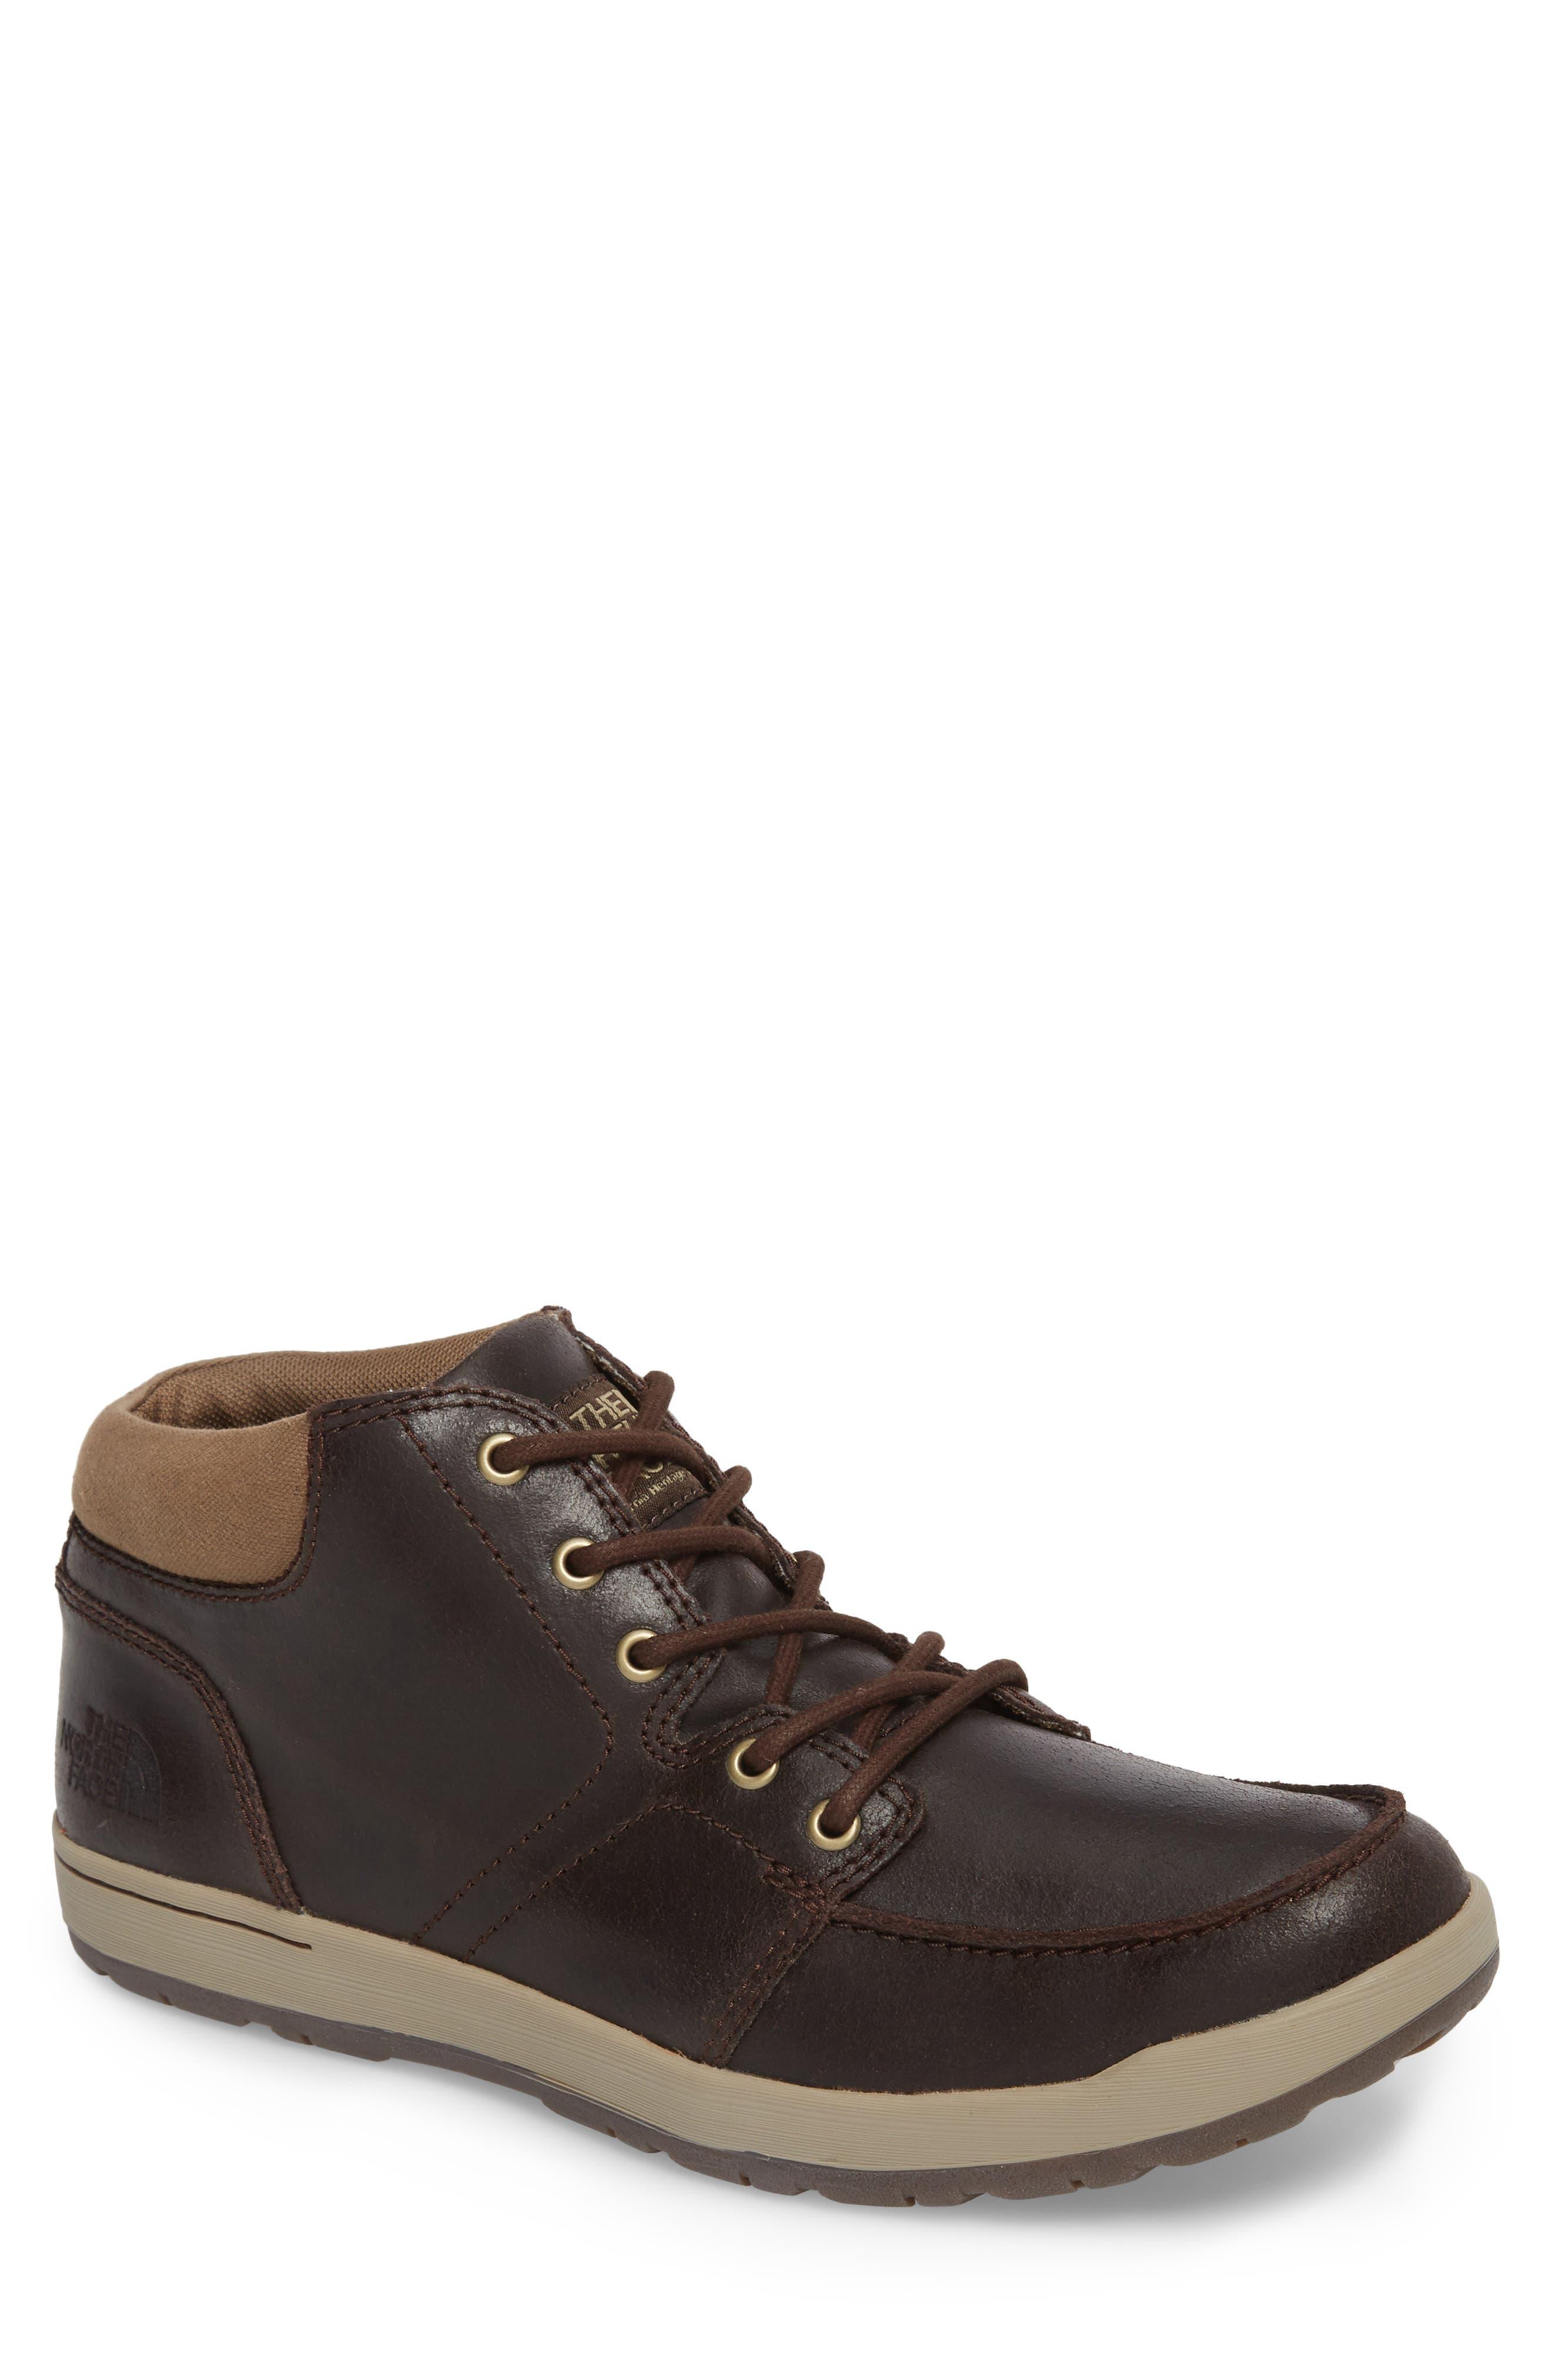 Ballard Evo Moc Toe Boot,                         Main,                         color, Demitasse Brown